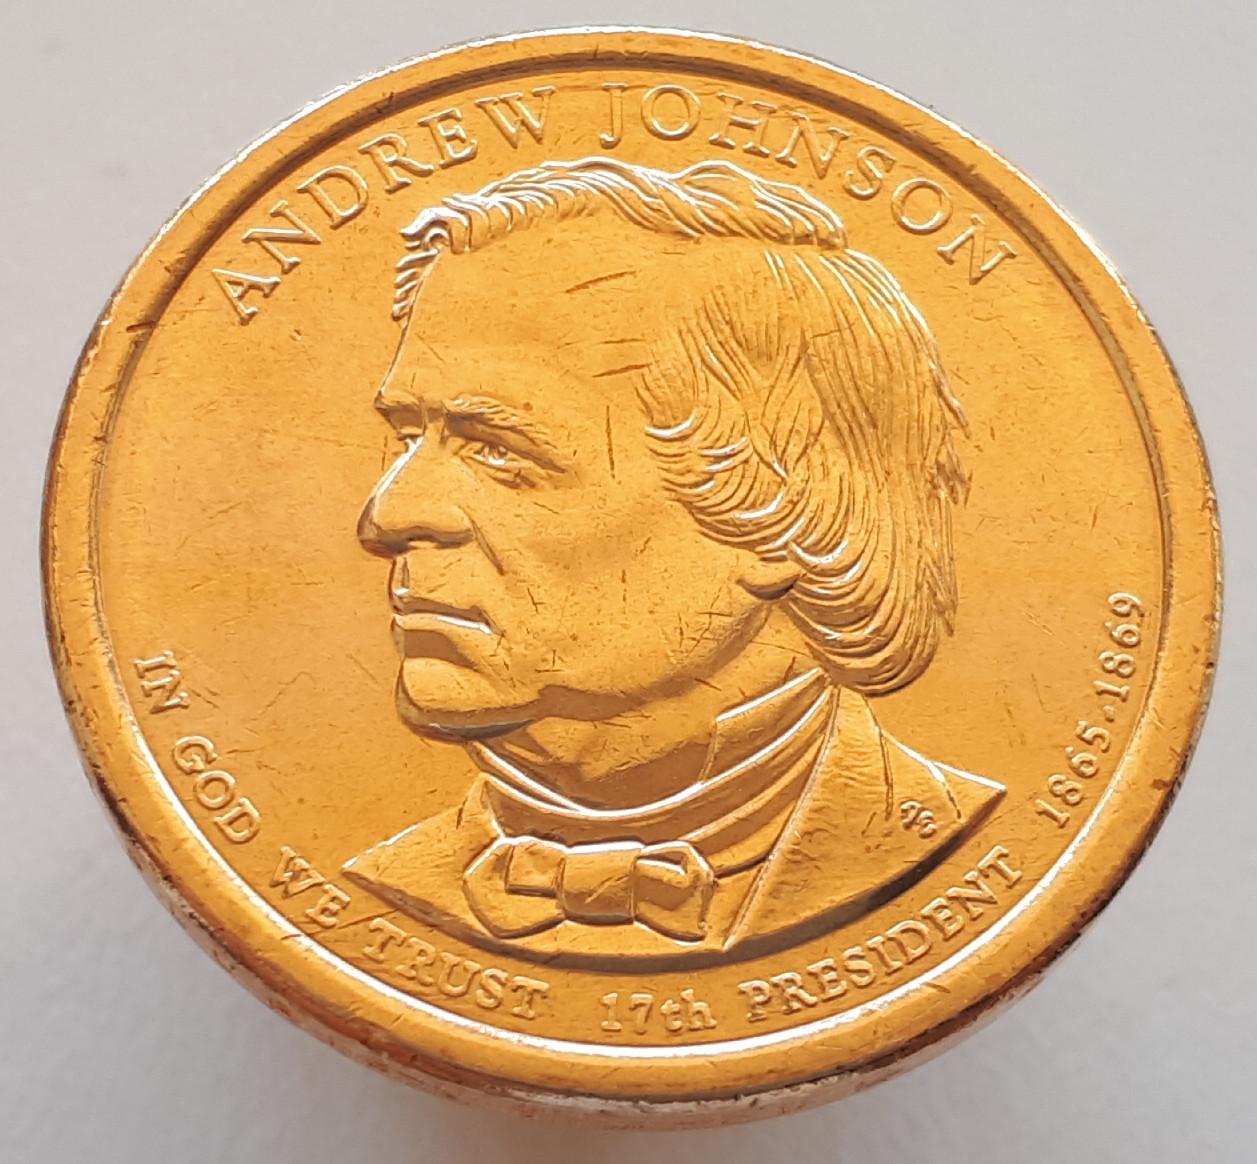 США 1 доллар 2011 - Эндрю Джонсон 17 Президент